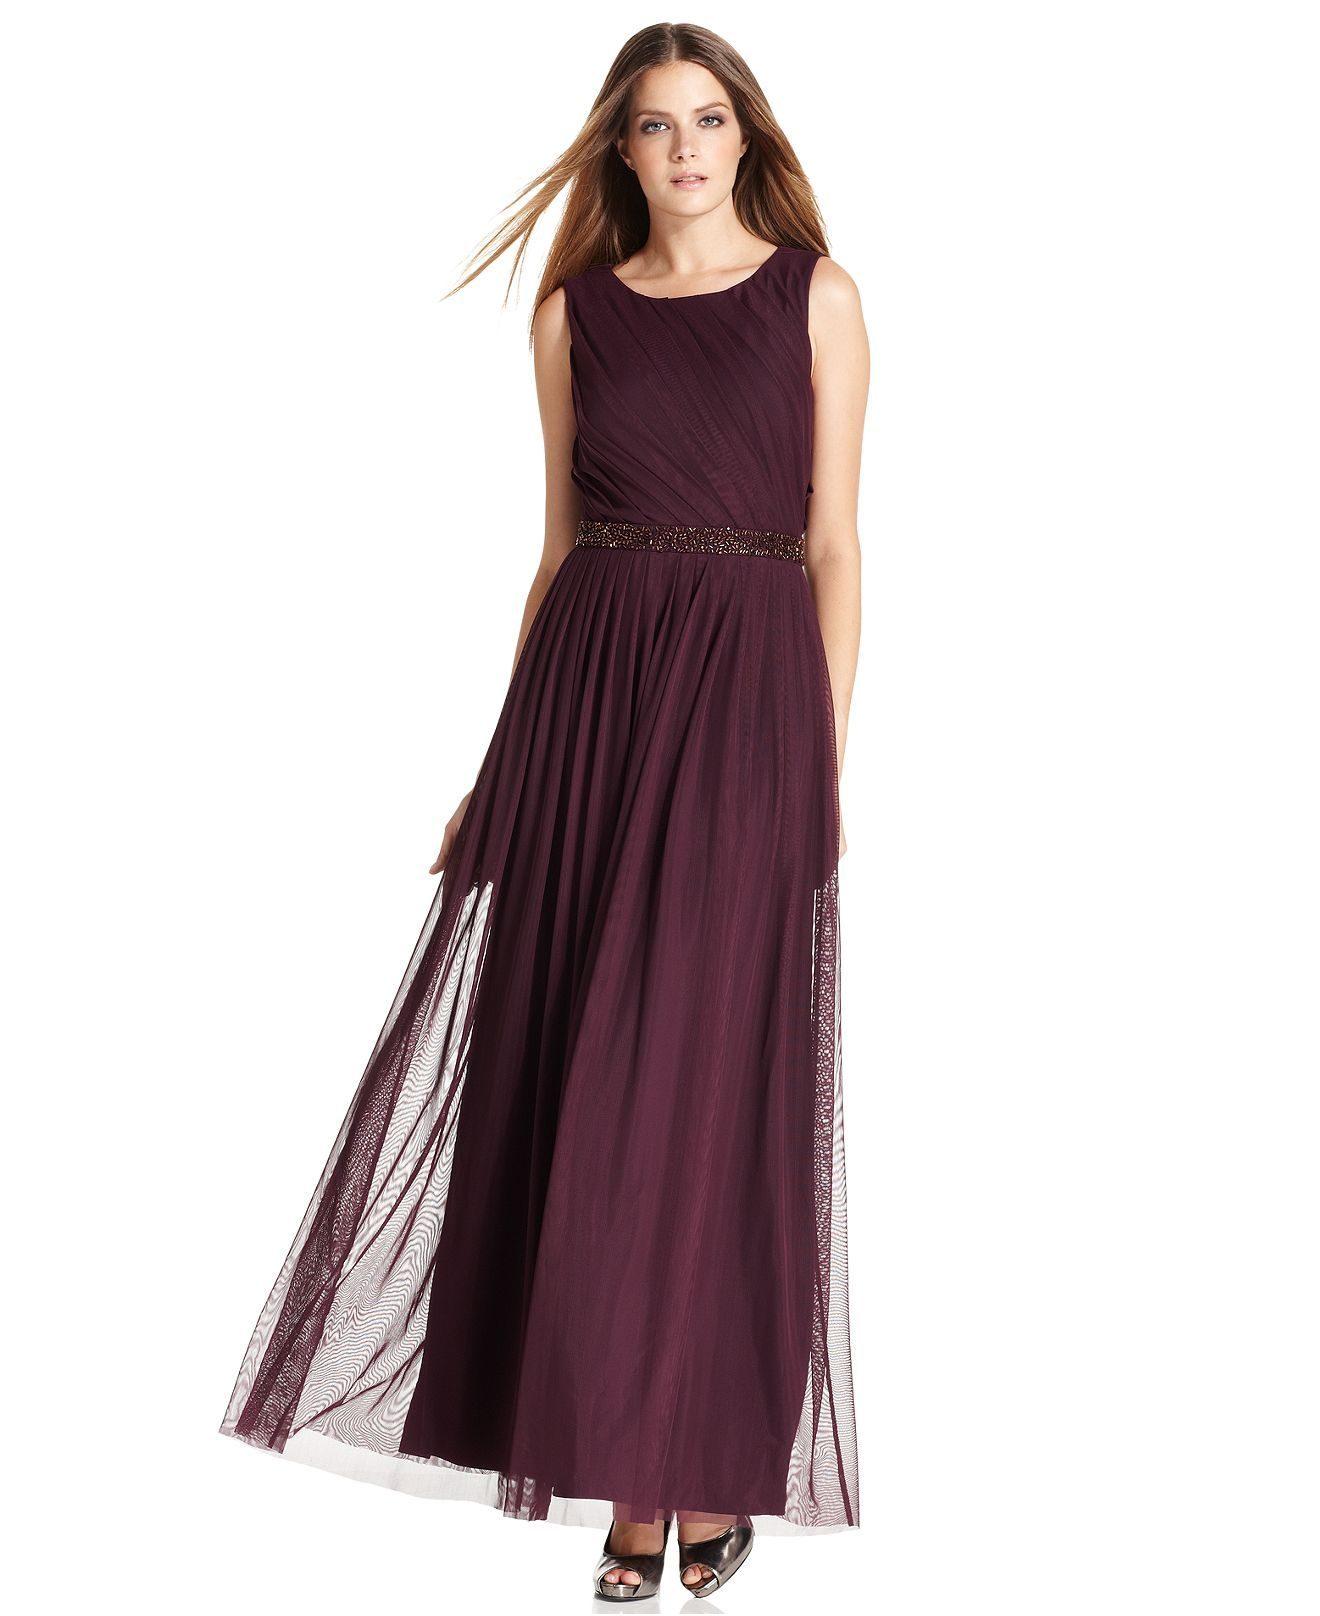 Calvin Klein Dress, Sleeveless Pleated Beaded Evening Gown - Womens ...